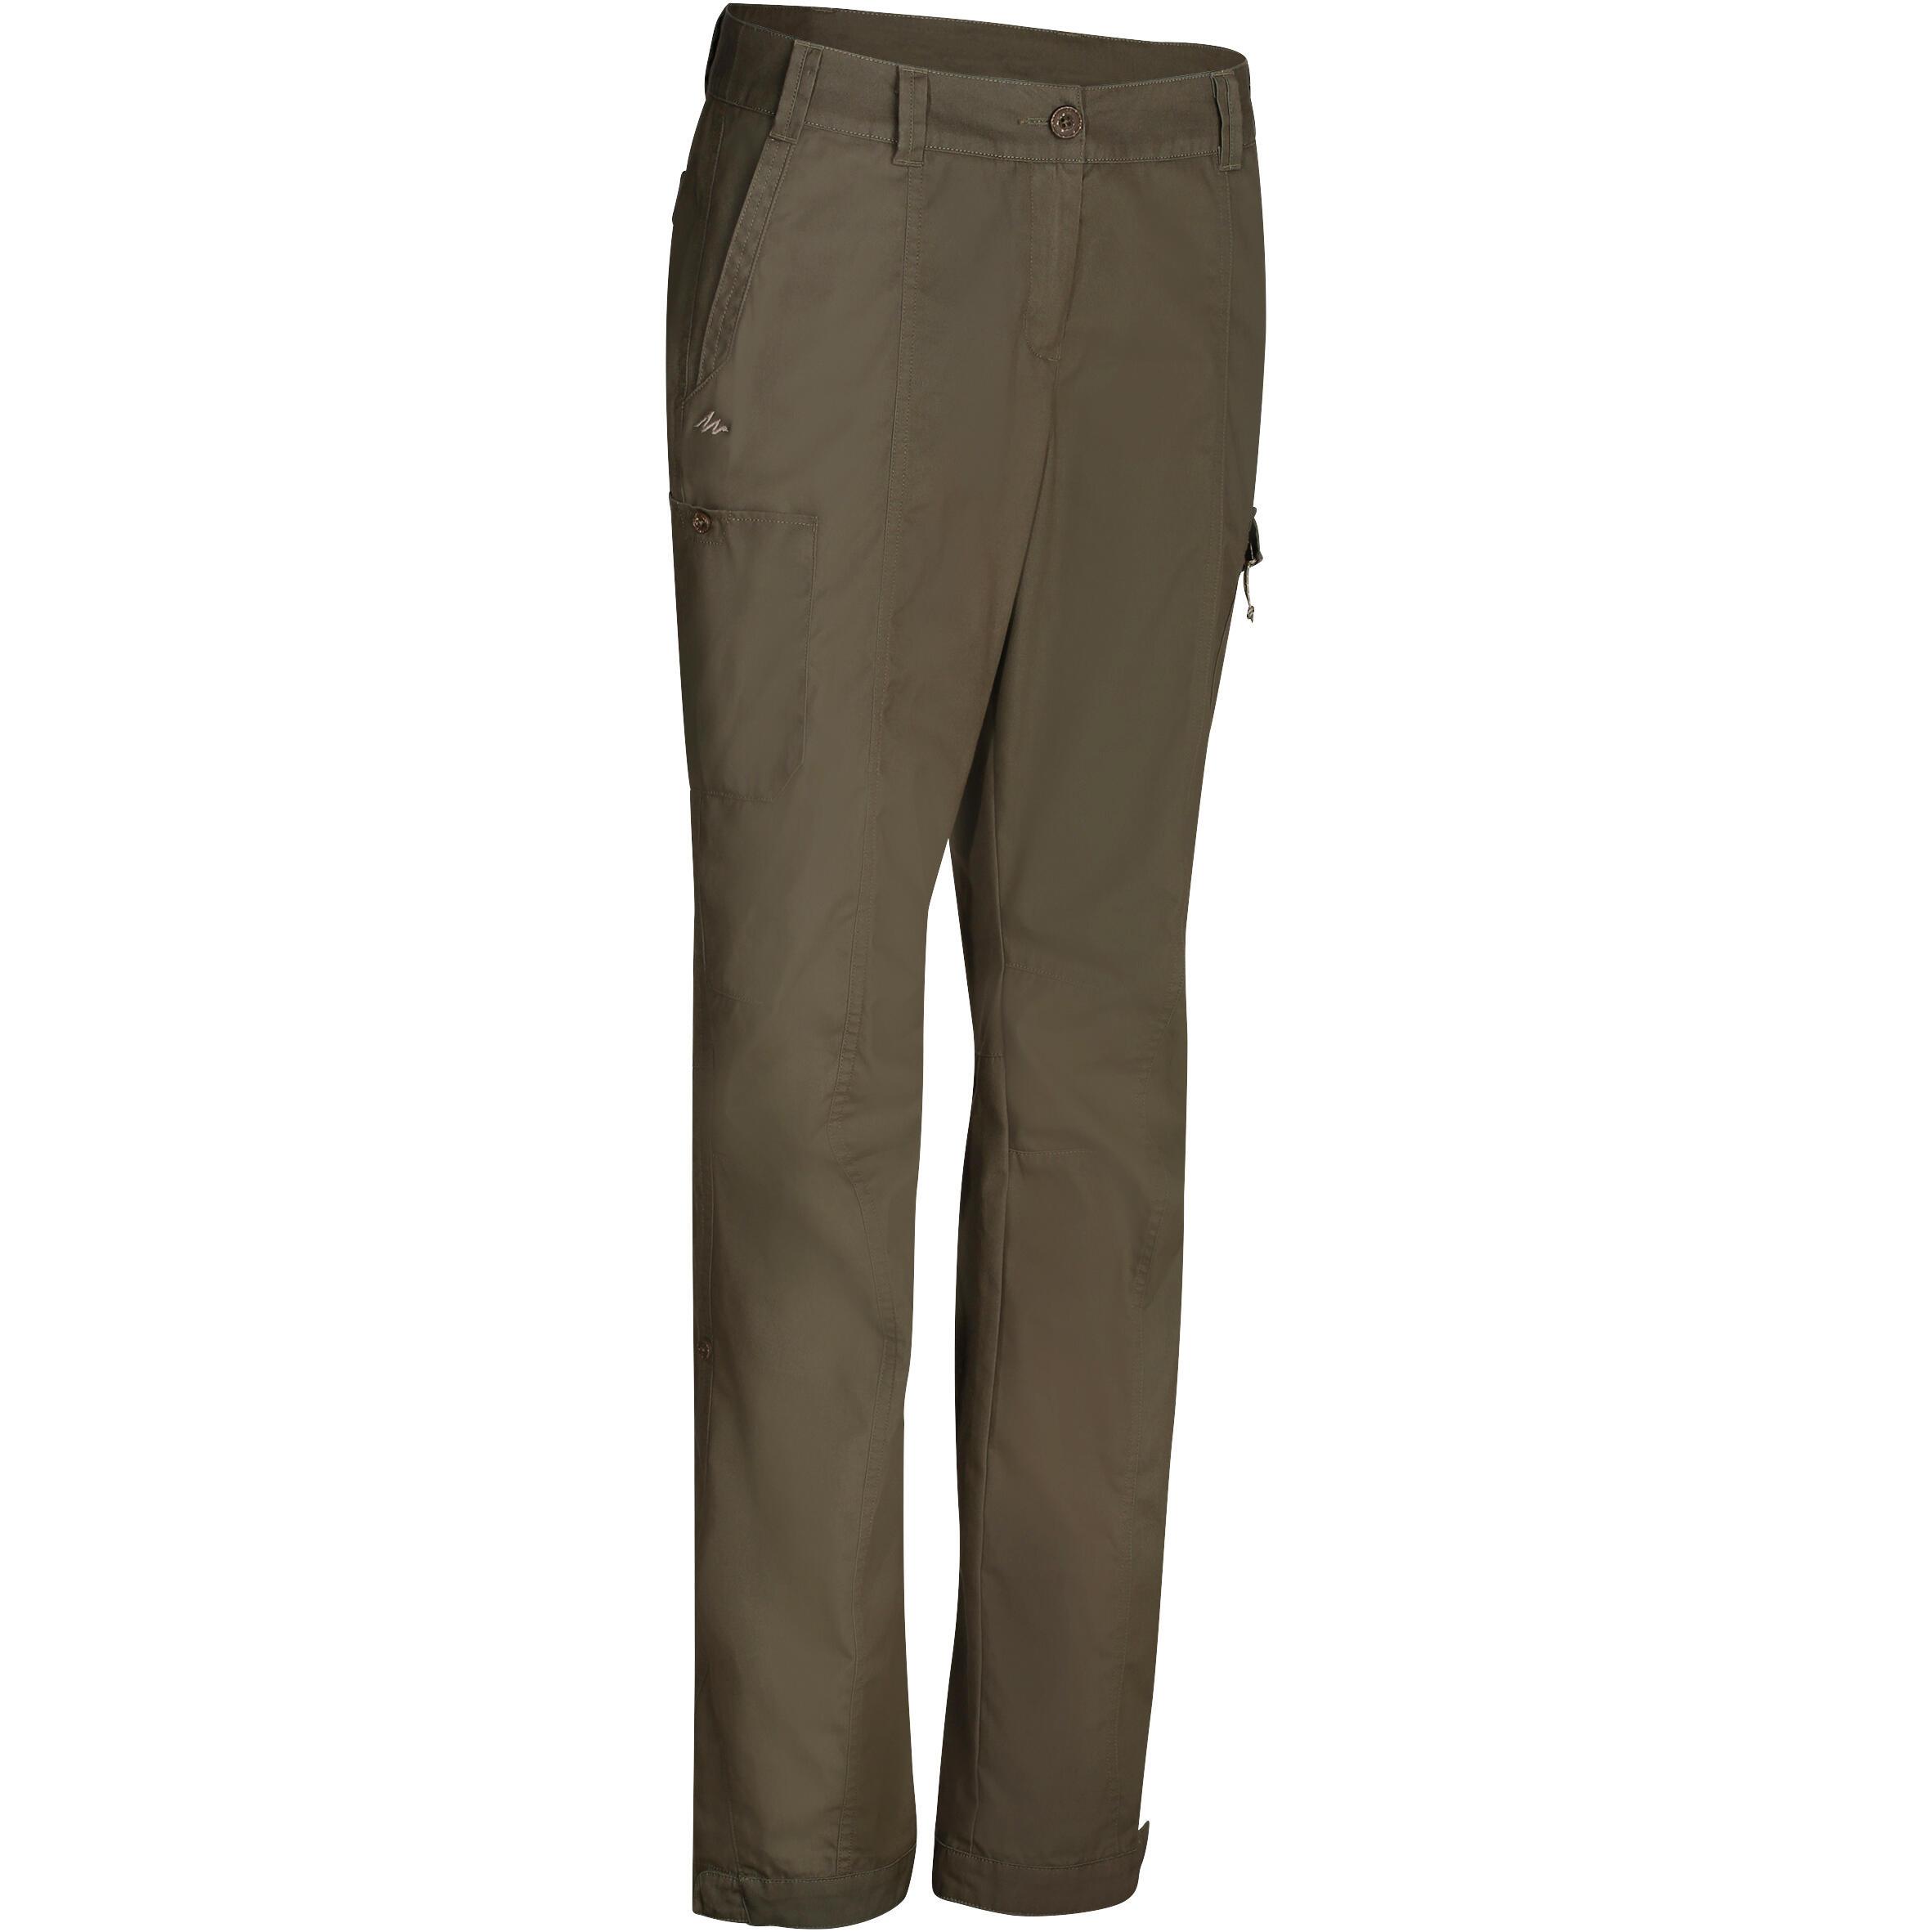 Pantalon VOYAGE 100 femme kaki